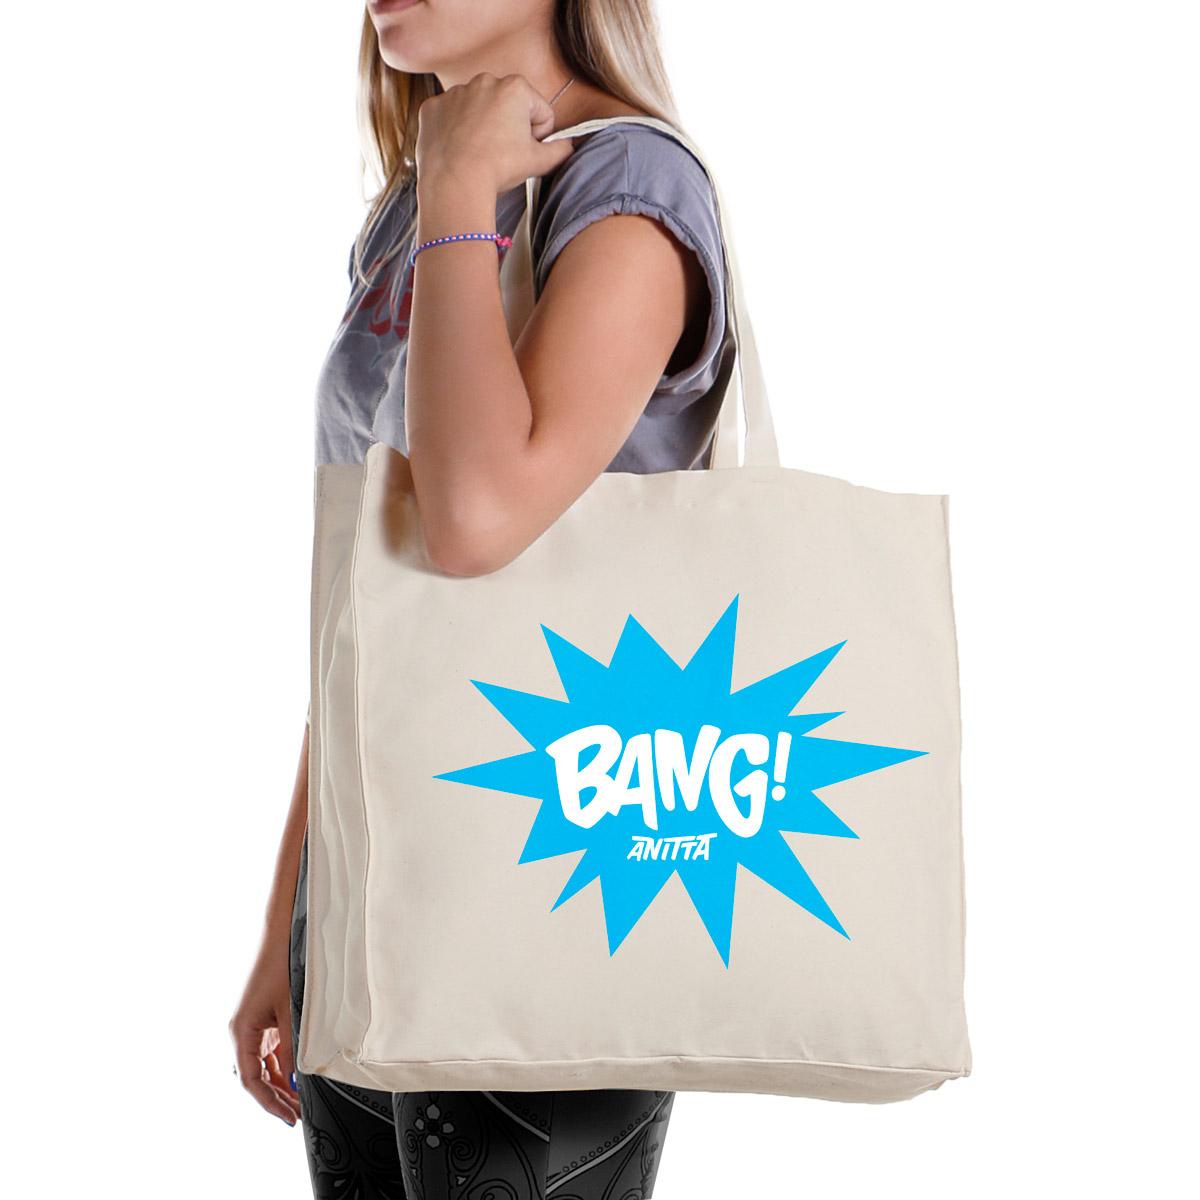 Ecobag Anitta Bang!